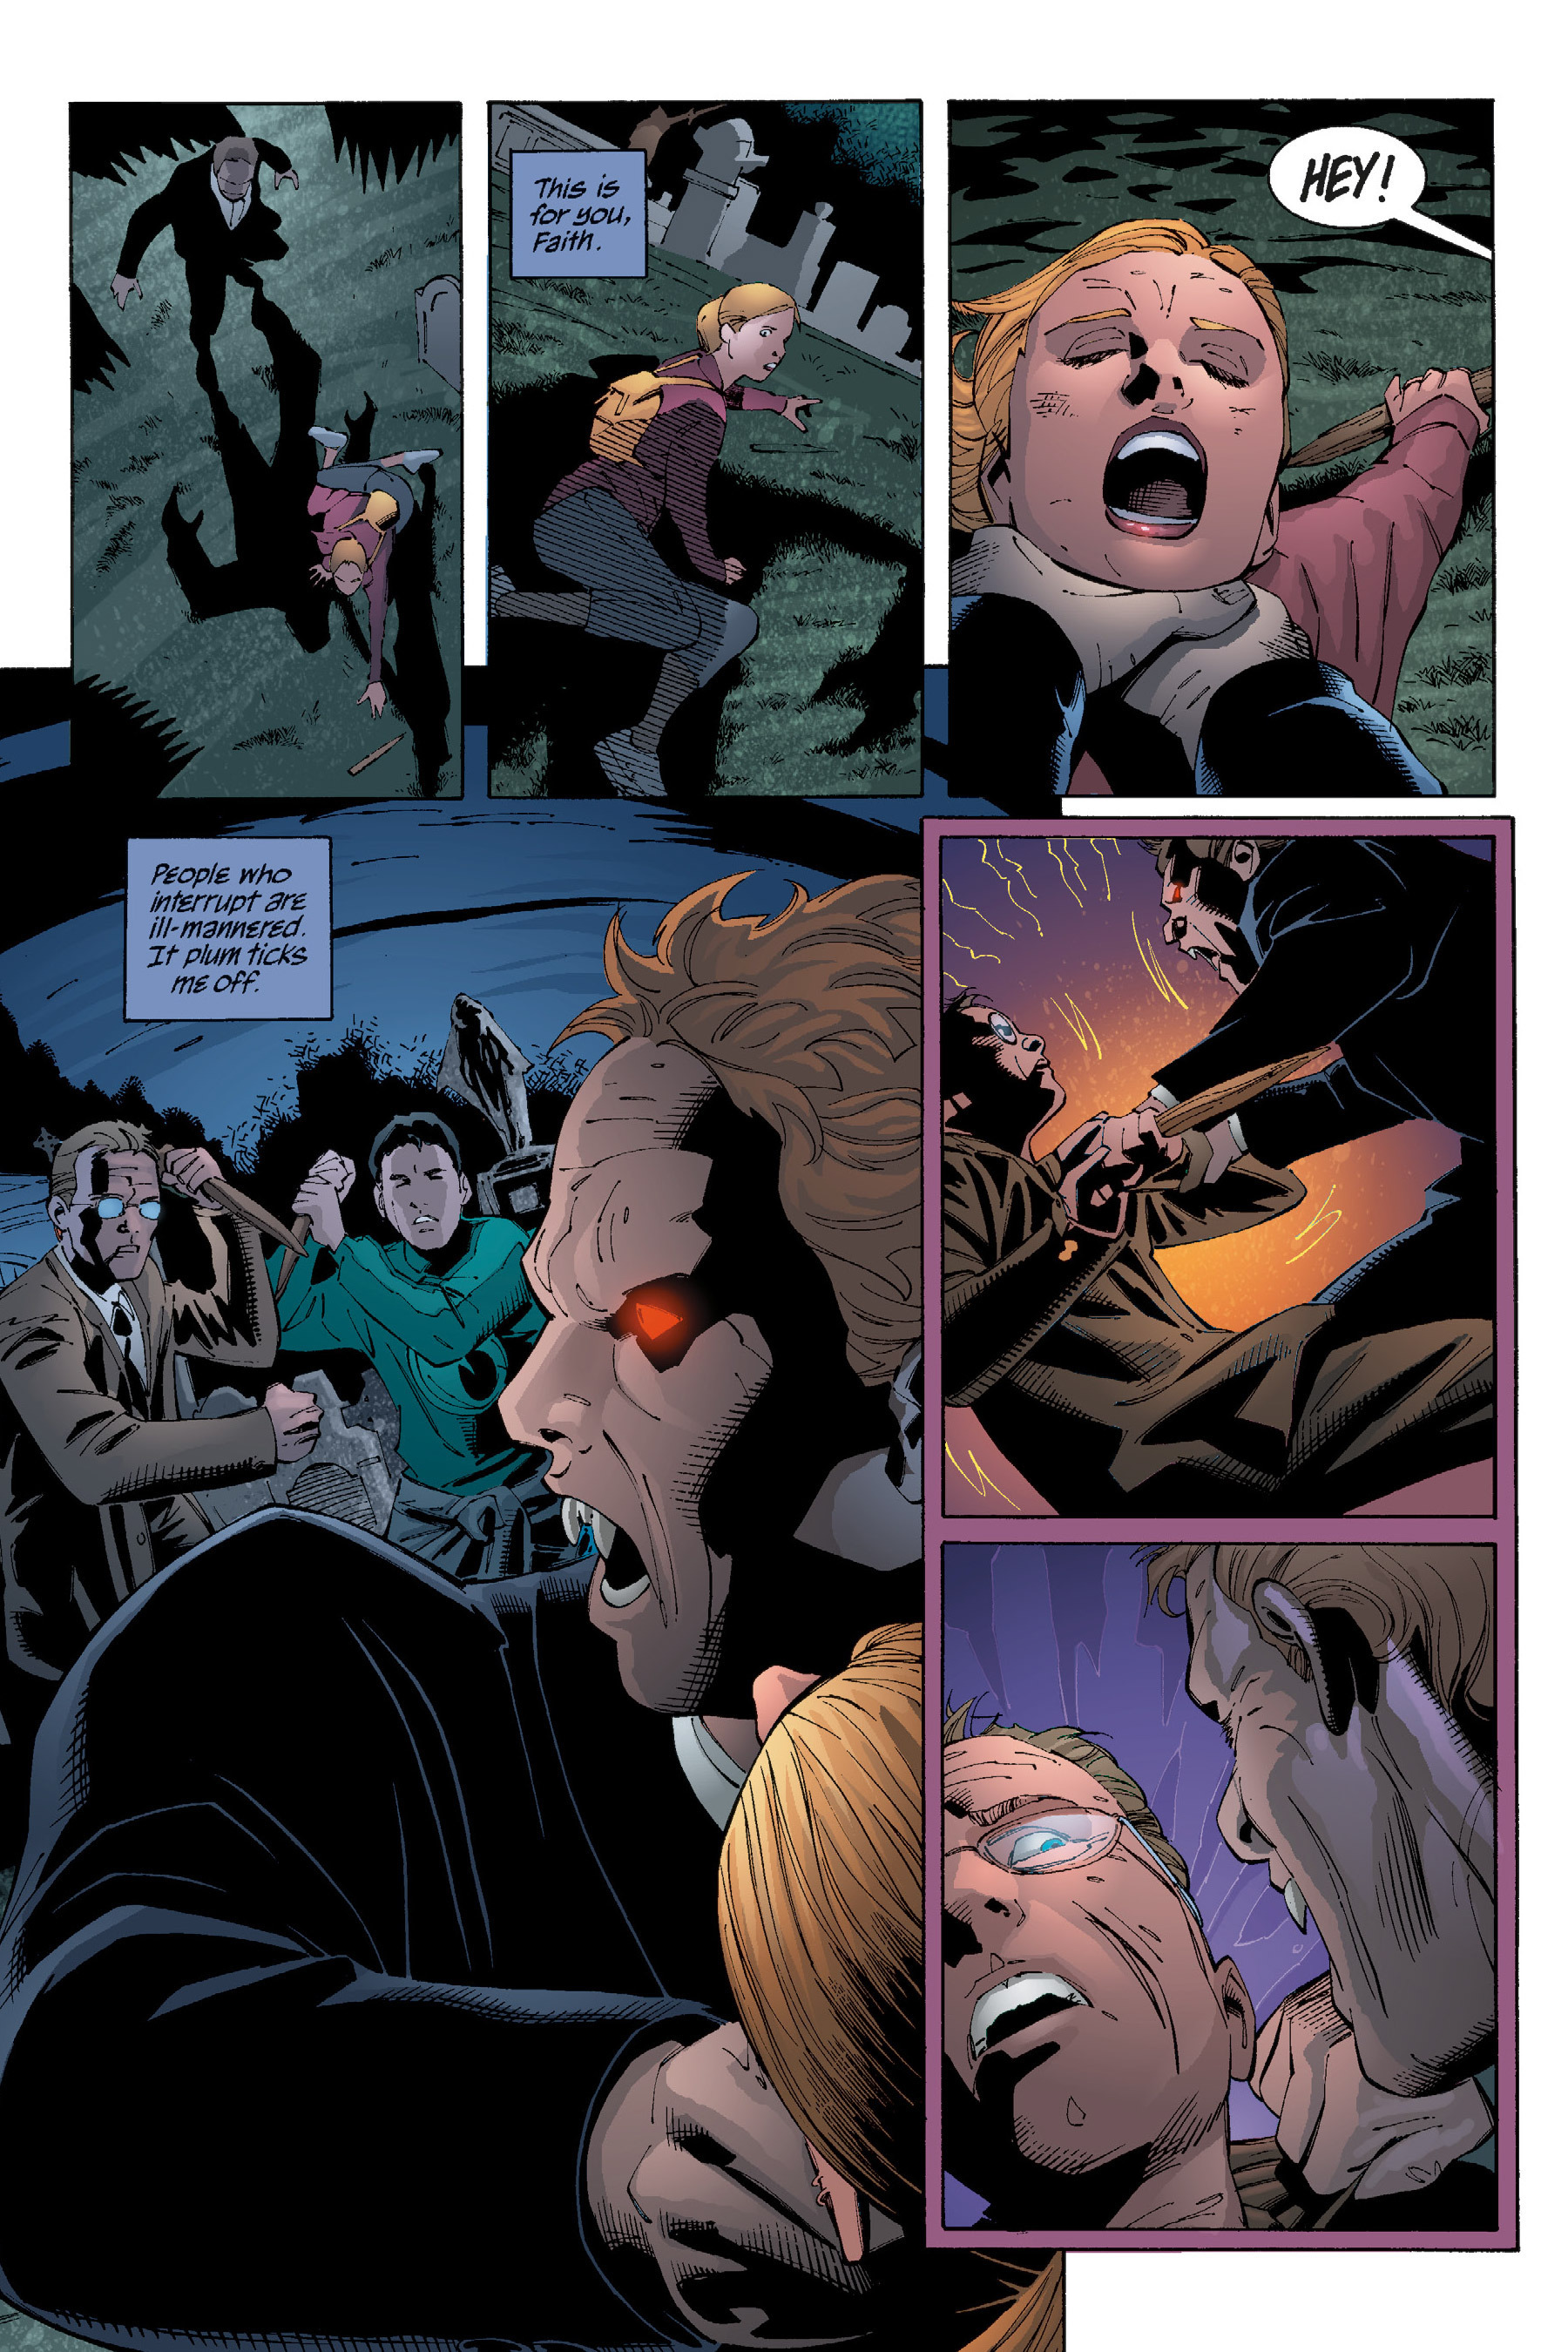 Read online Buffy the Vampire Slayer: Omnibus comic -  Issue # TPB 5 - 34